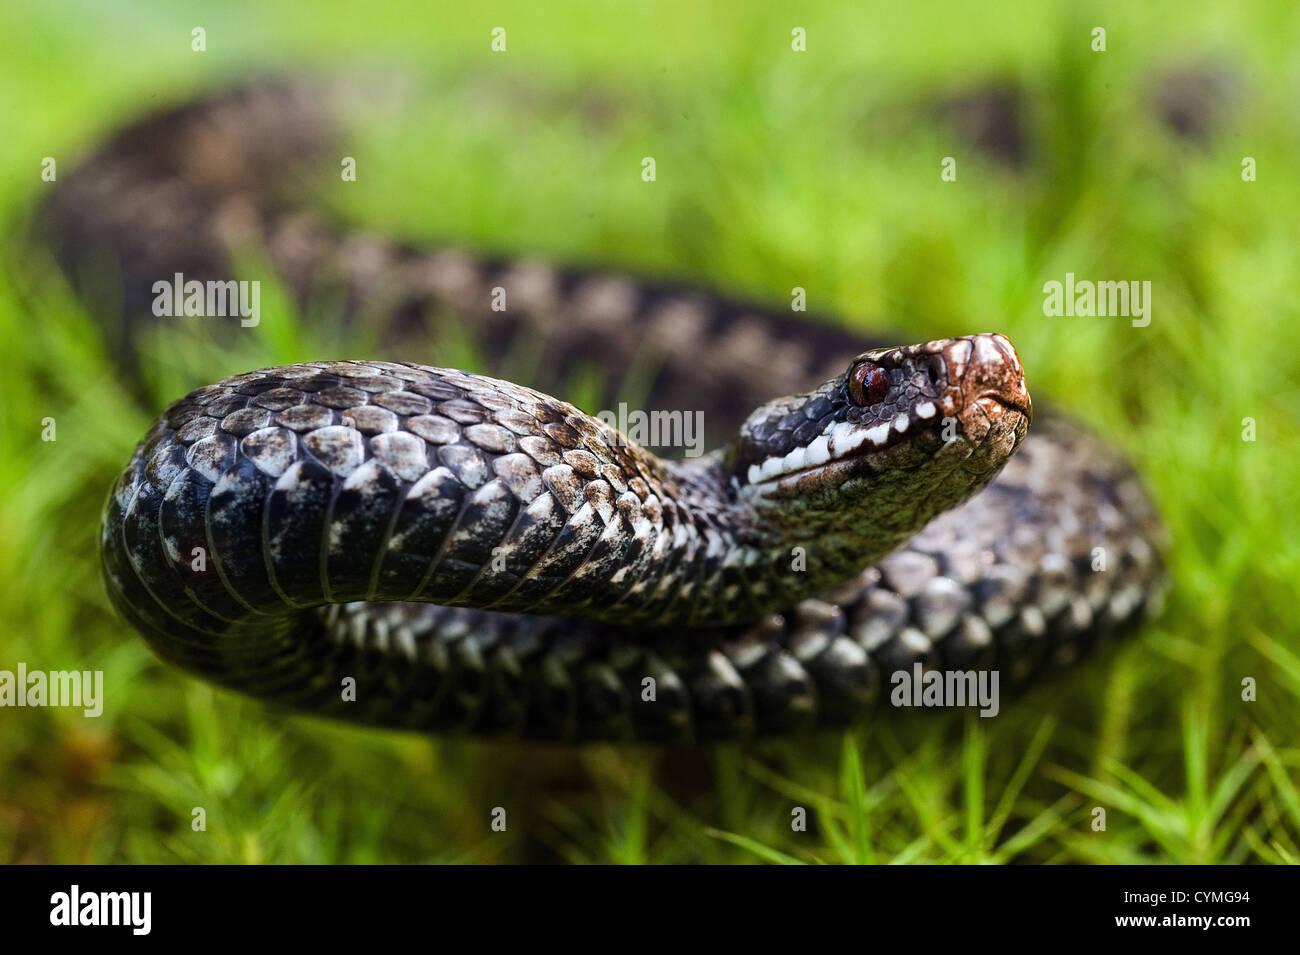 Viper before attack - Stock Image